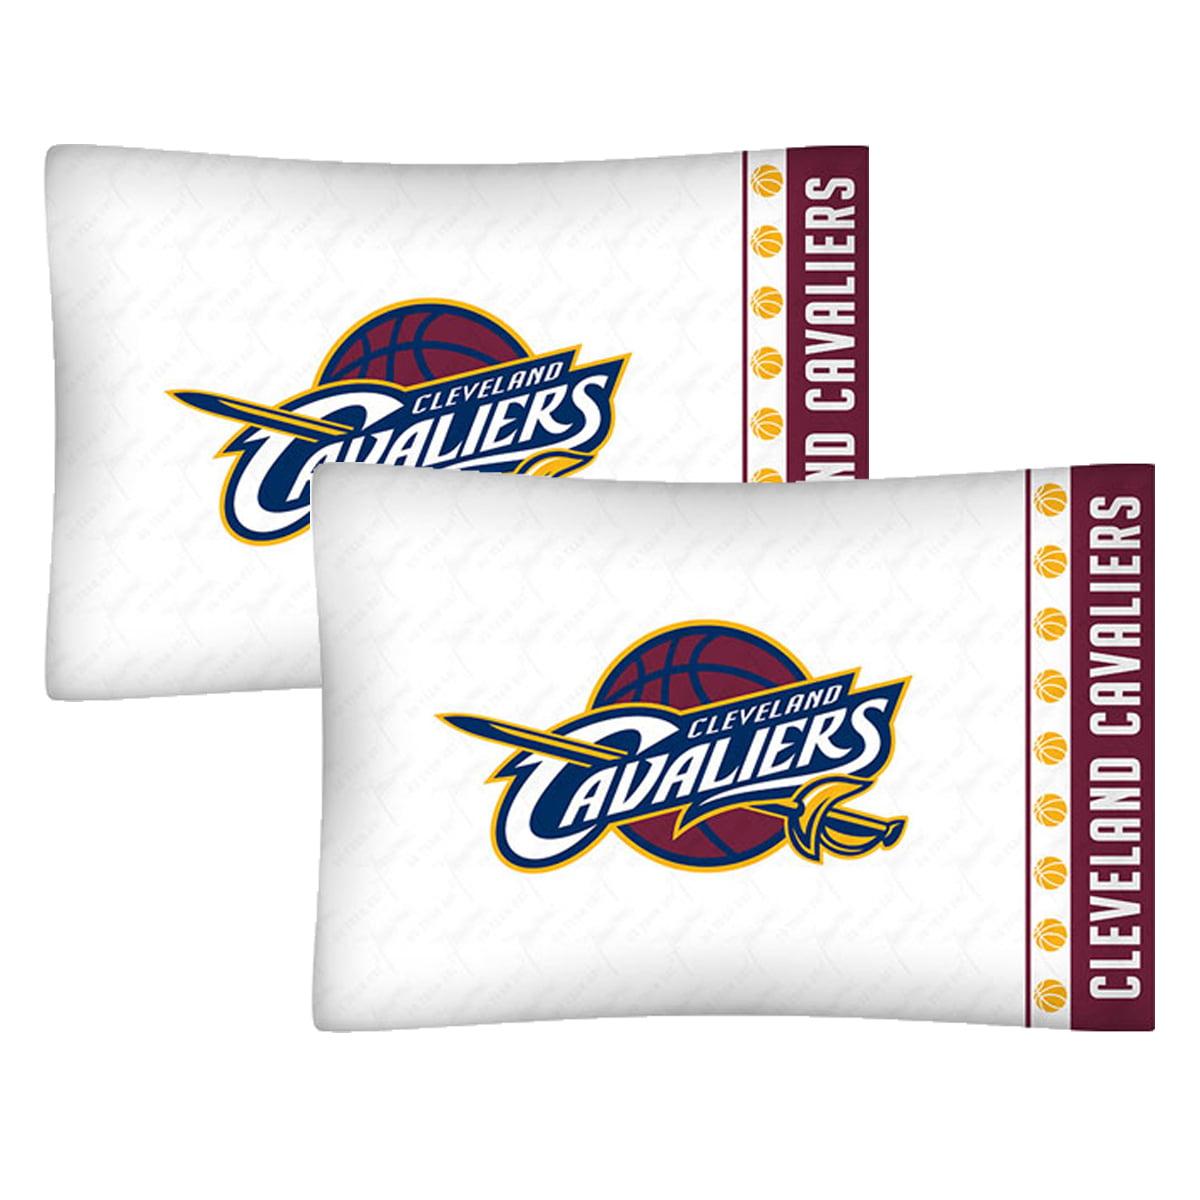 NBA Cleveland Cavaliers Pillowcase Set Basketball Bedding